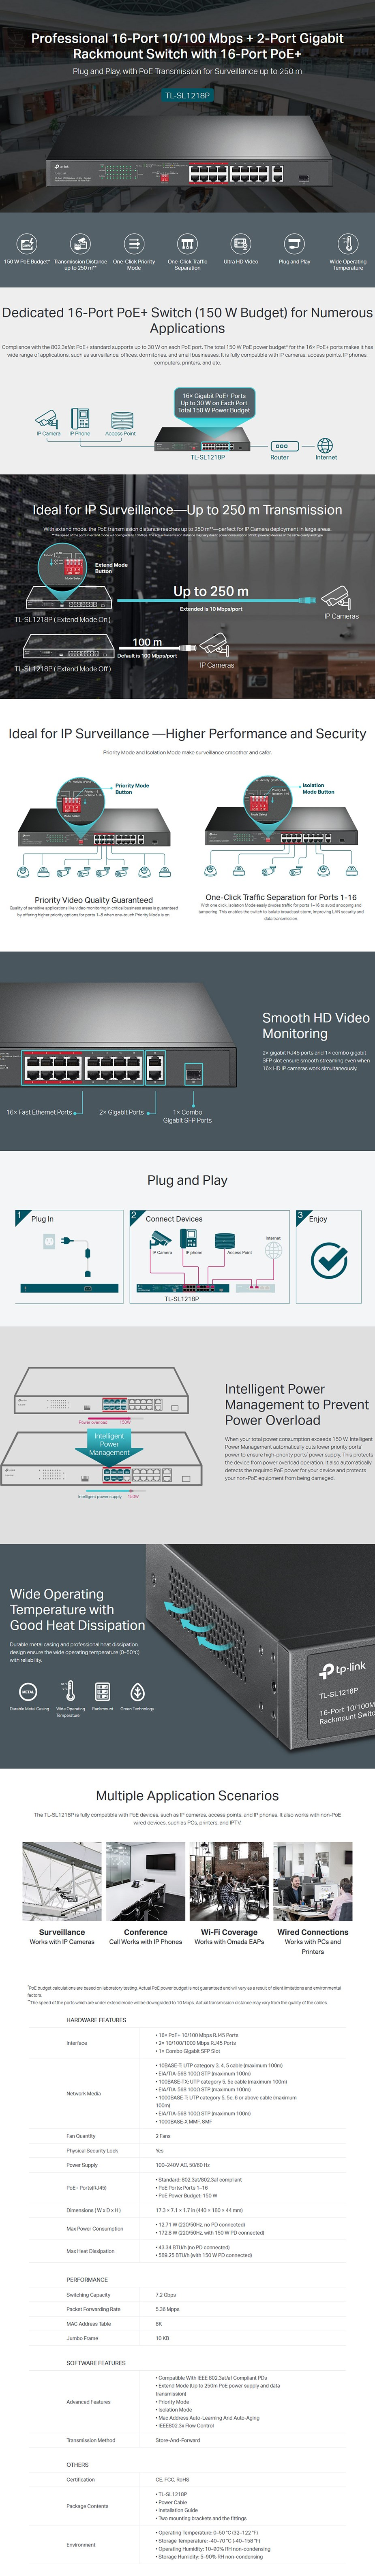 TP-Link TL-SL1218P 16-Port 10/100 Mbps + 2-Port Gigabit Rackmount Switch w/PoE+ - Overview 1